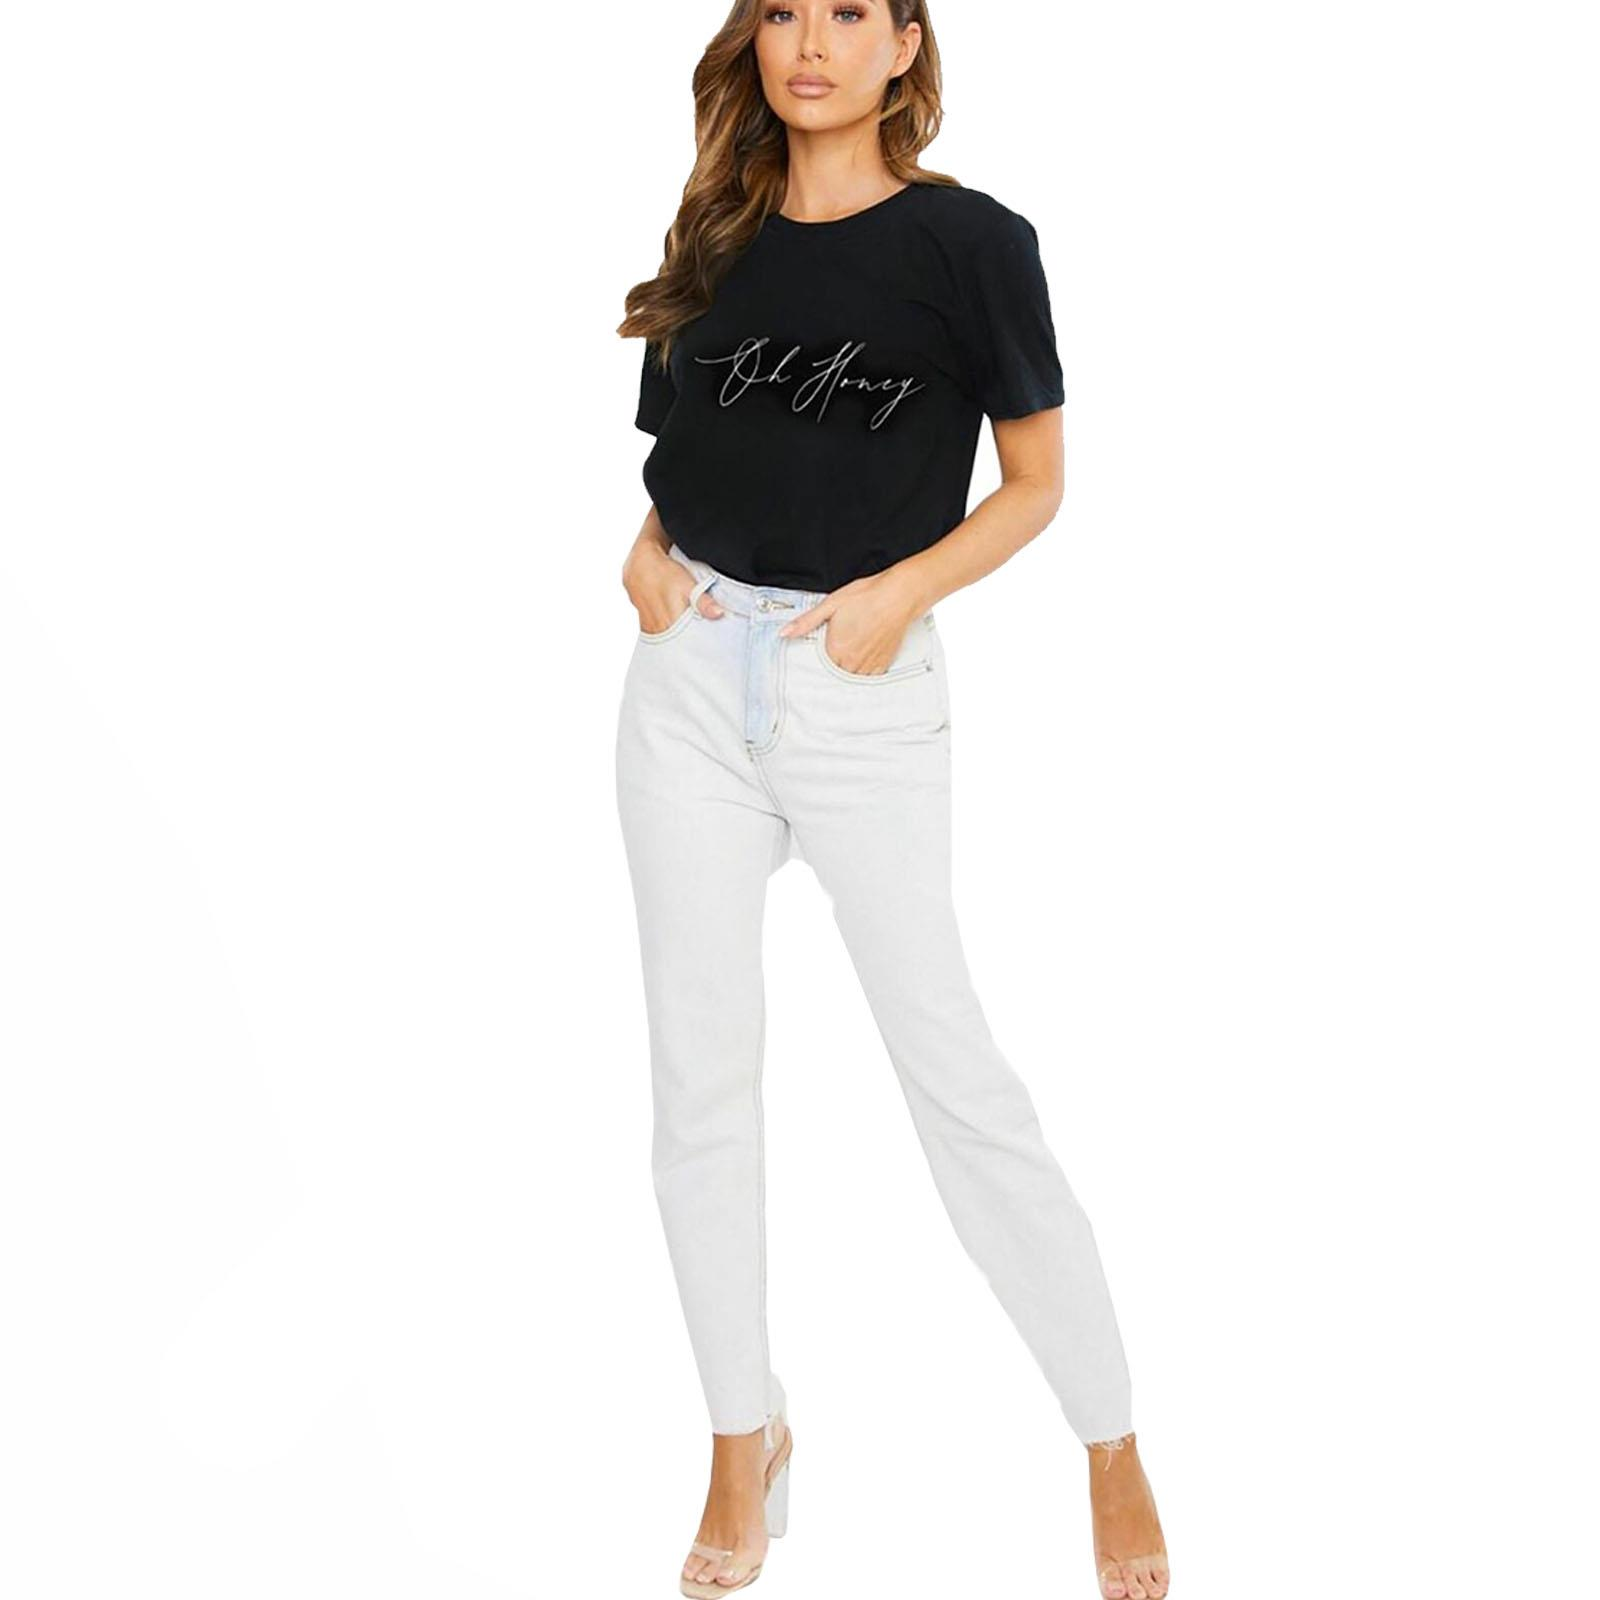 thumbnail 3 - Womens OH HONEY Slogan Fashion T-Shirt Ladies Casual Summer Short Sleeve Tops